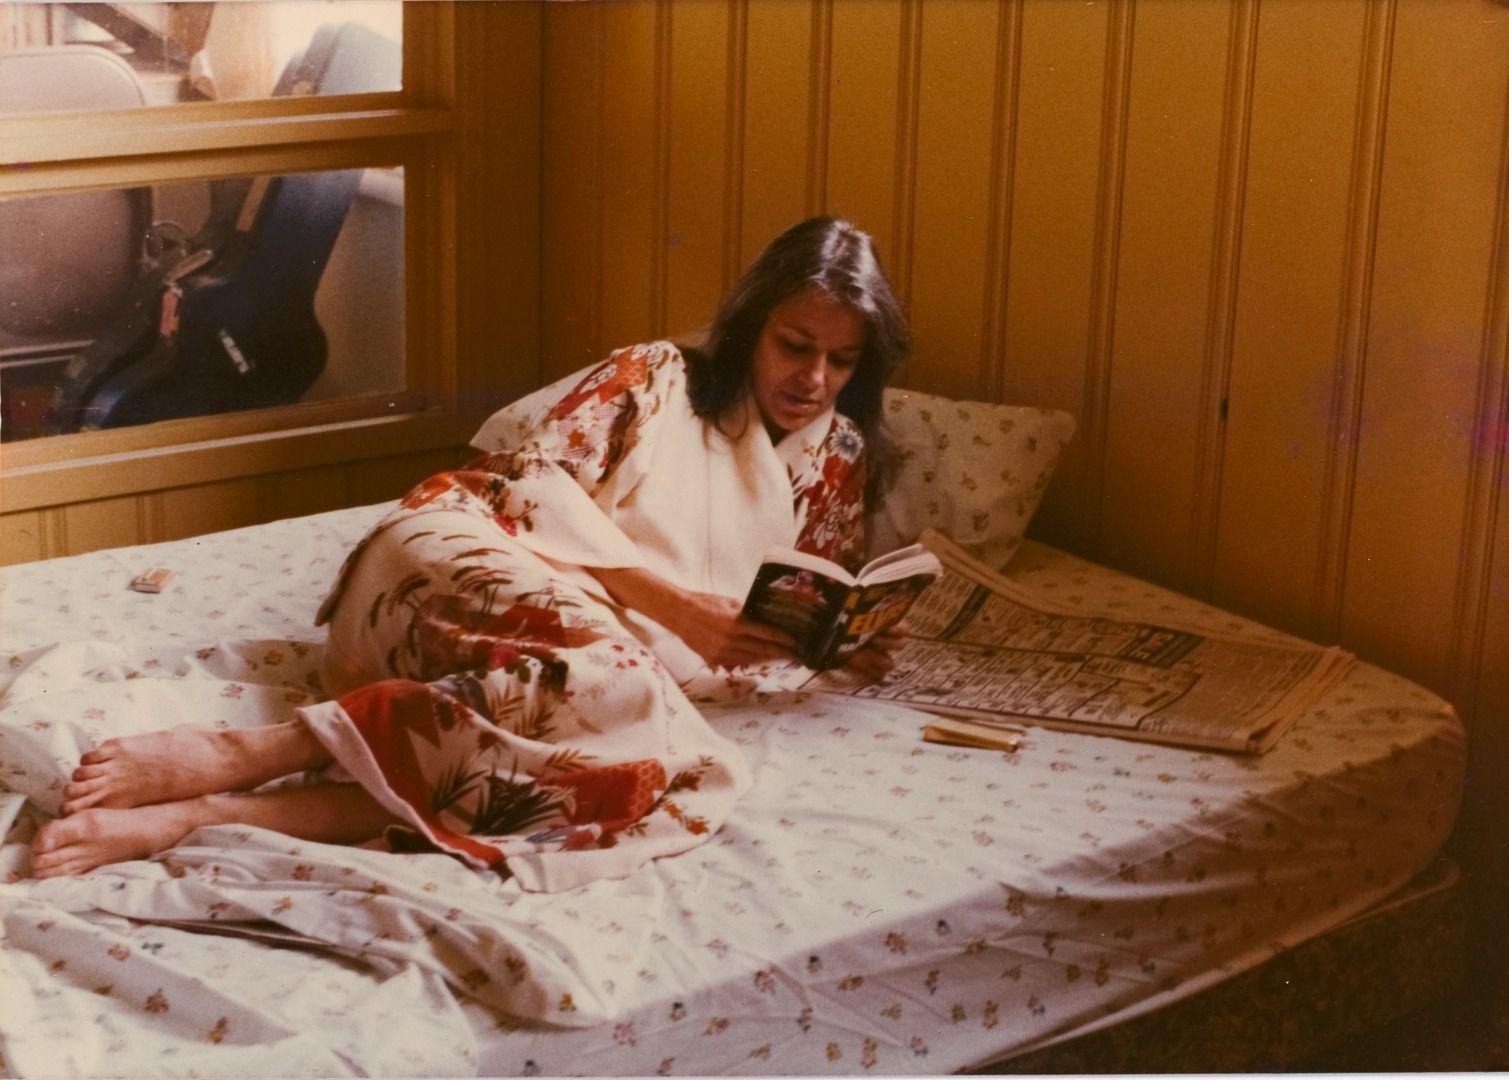 Susanna Clark, as seen in the movie.